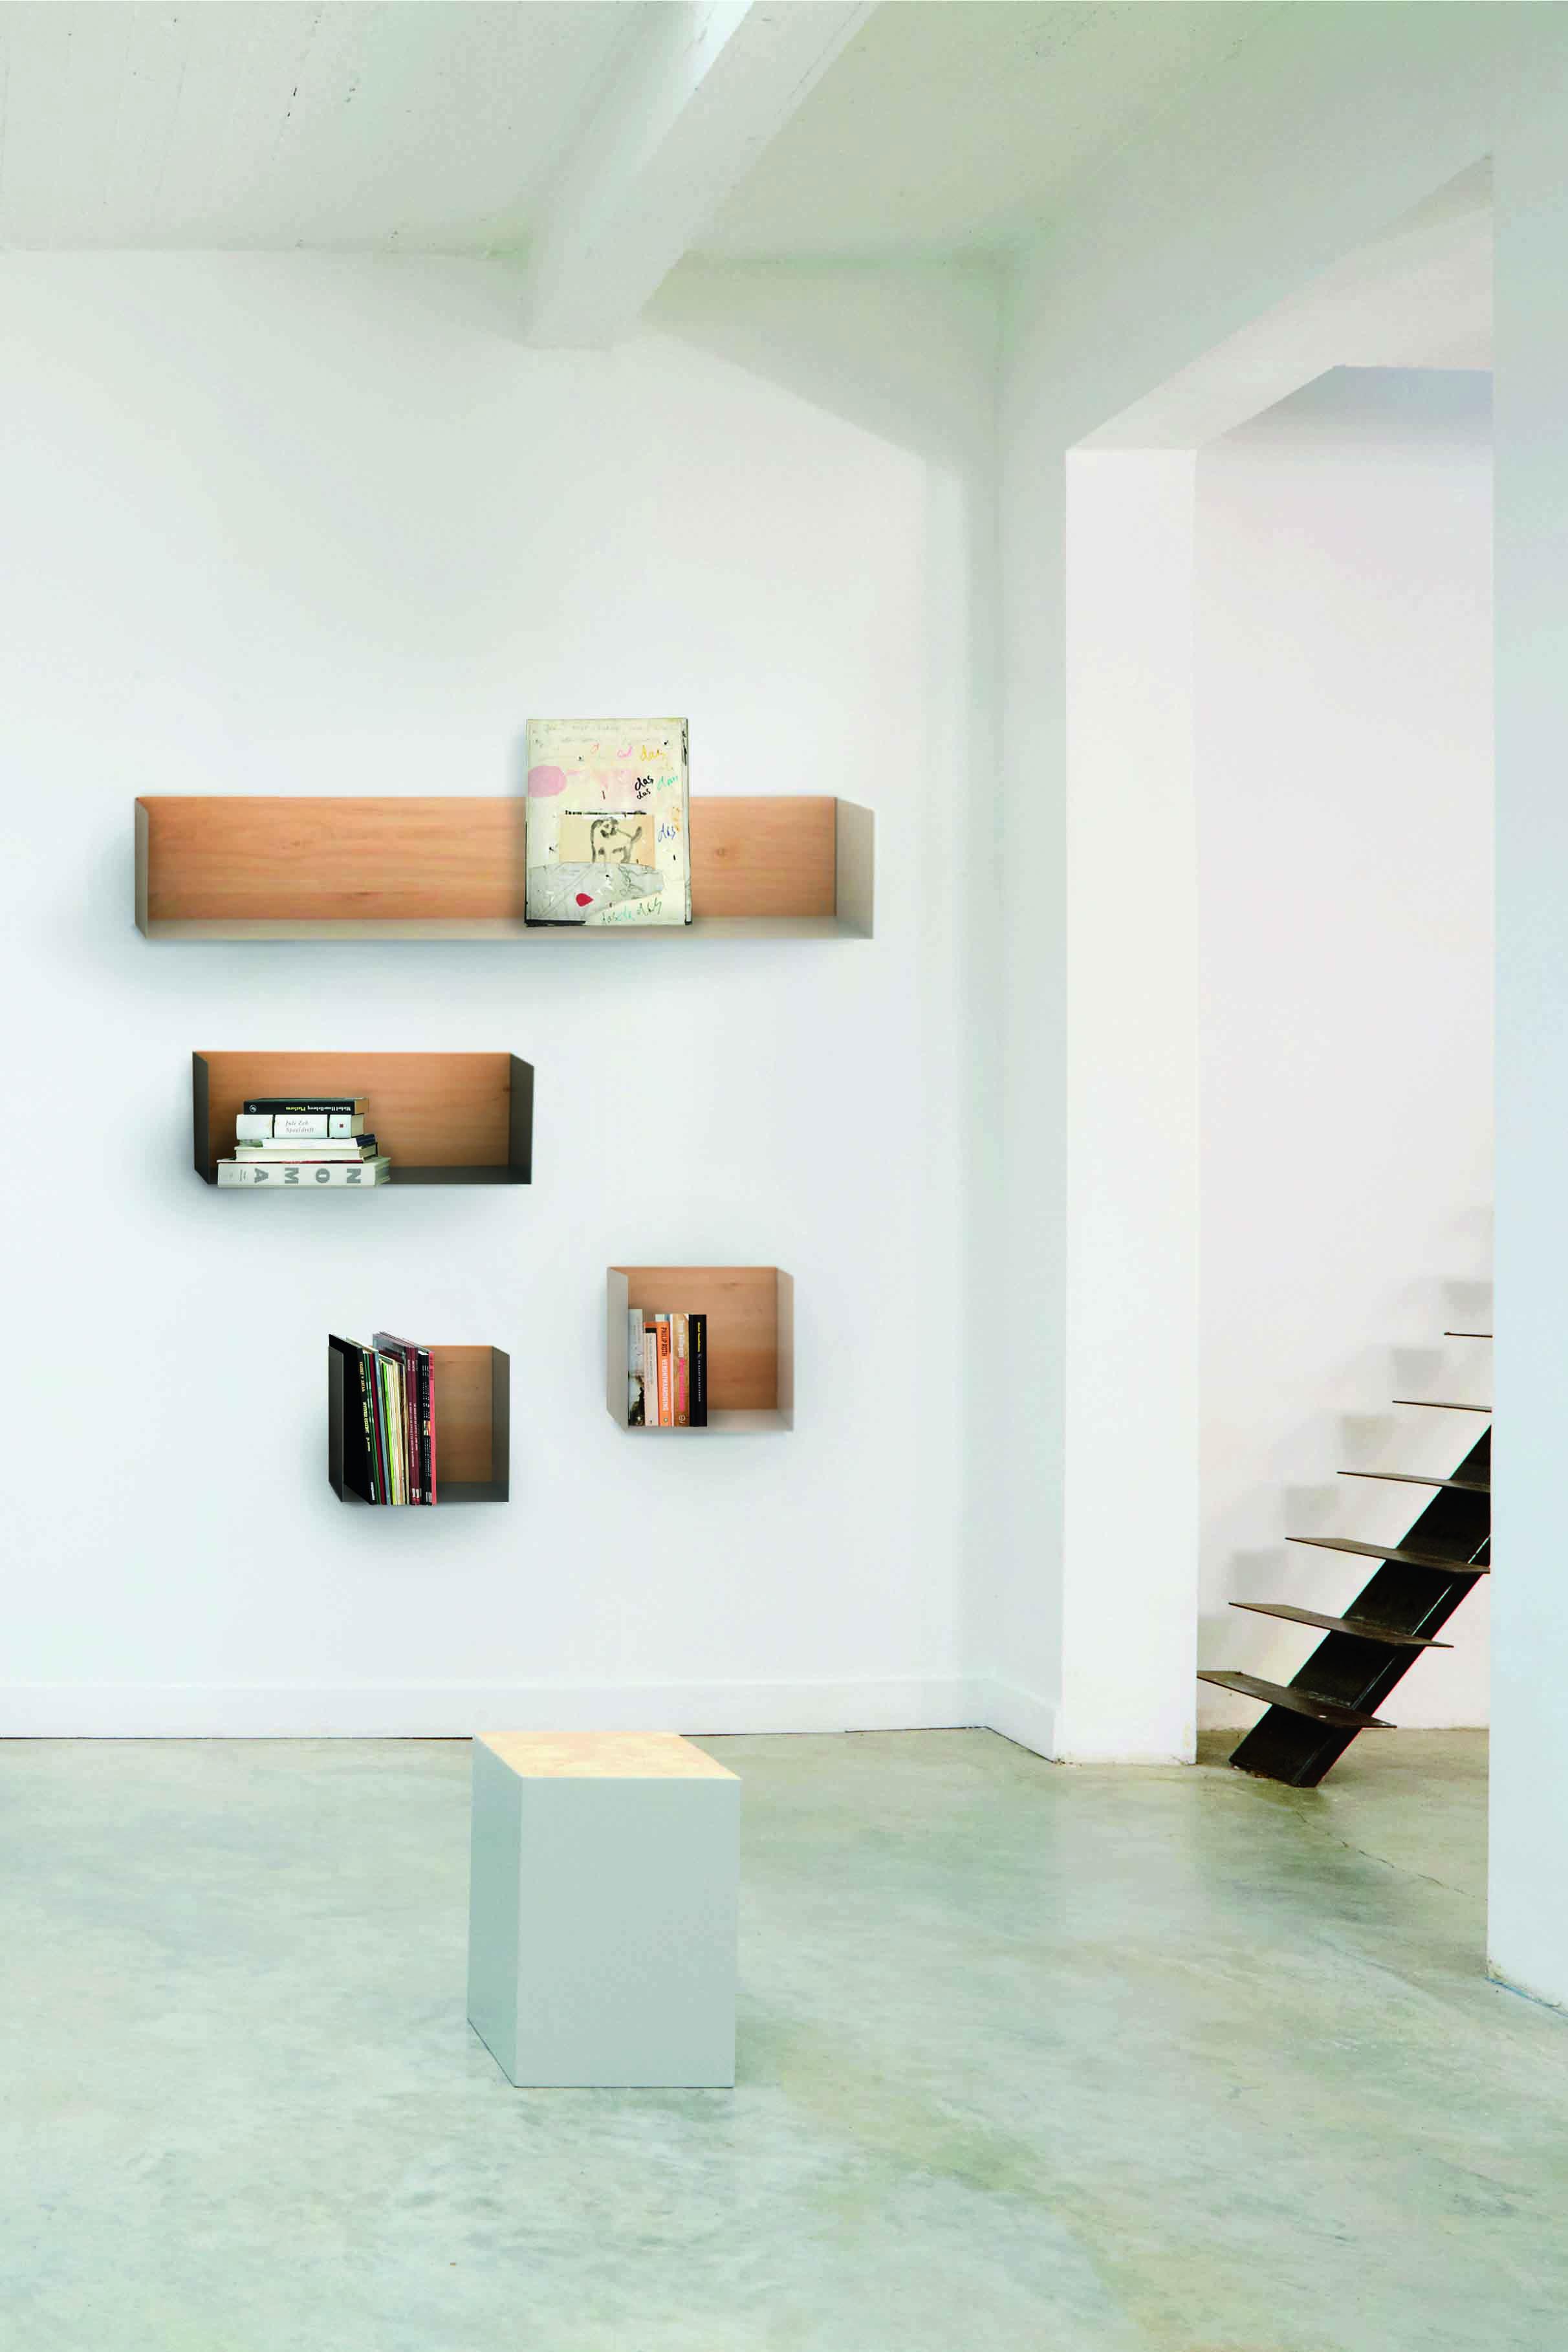 026204-U-shelves-2.jpg